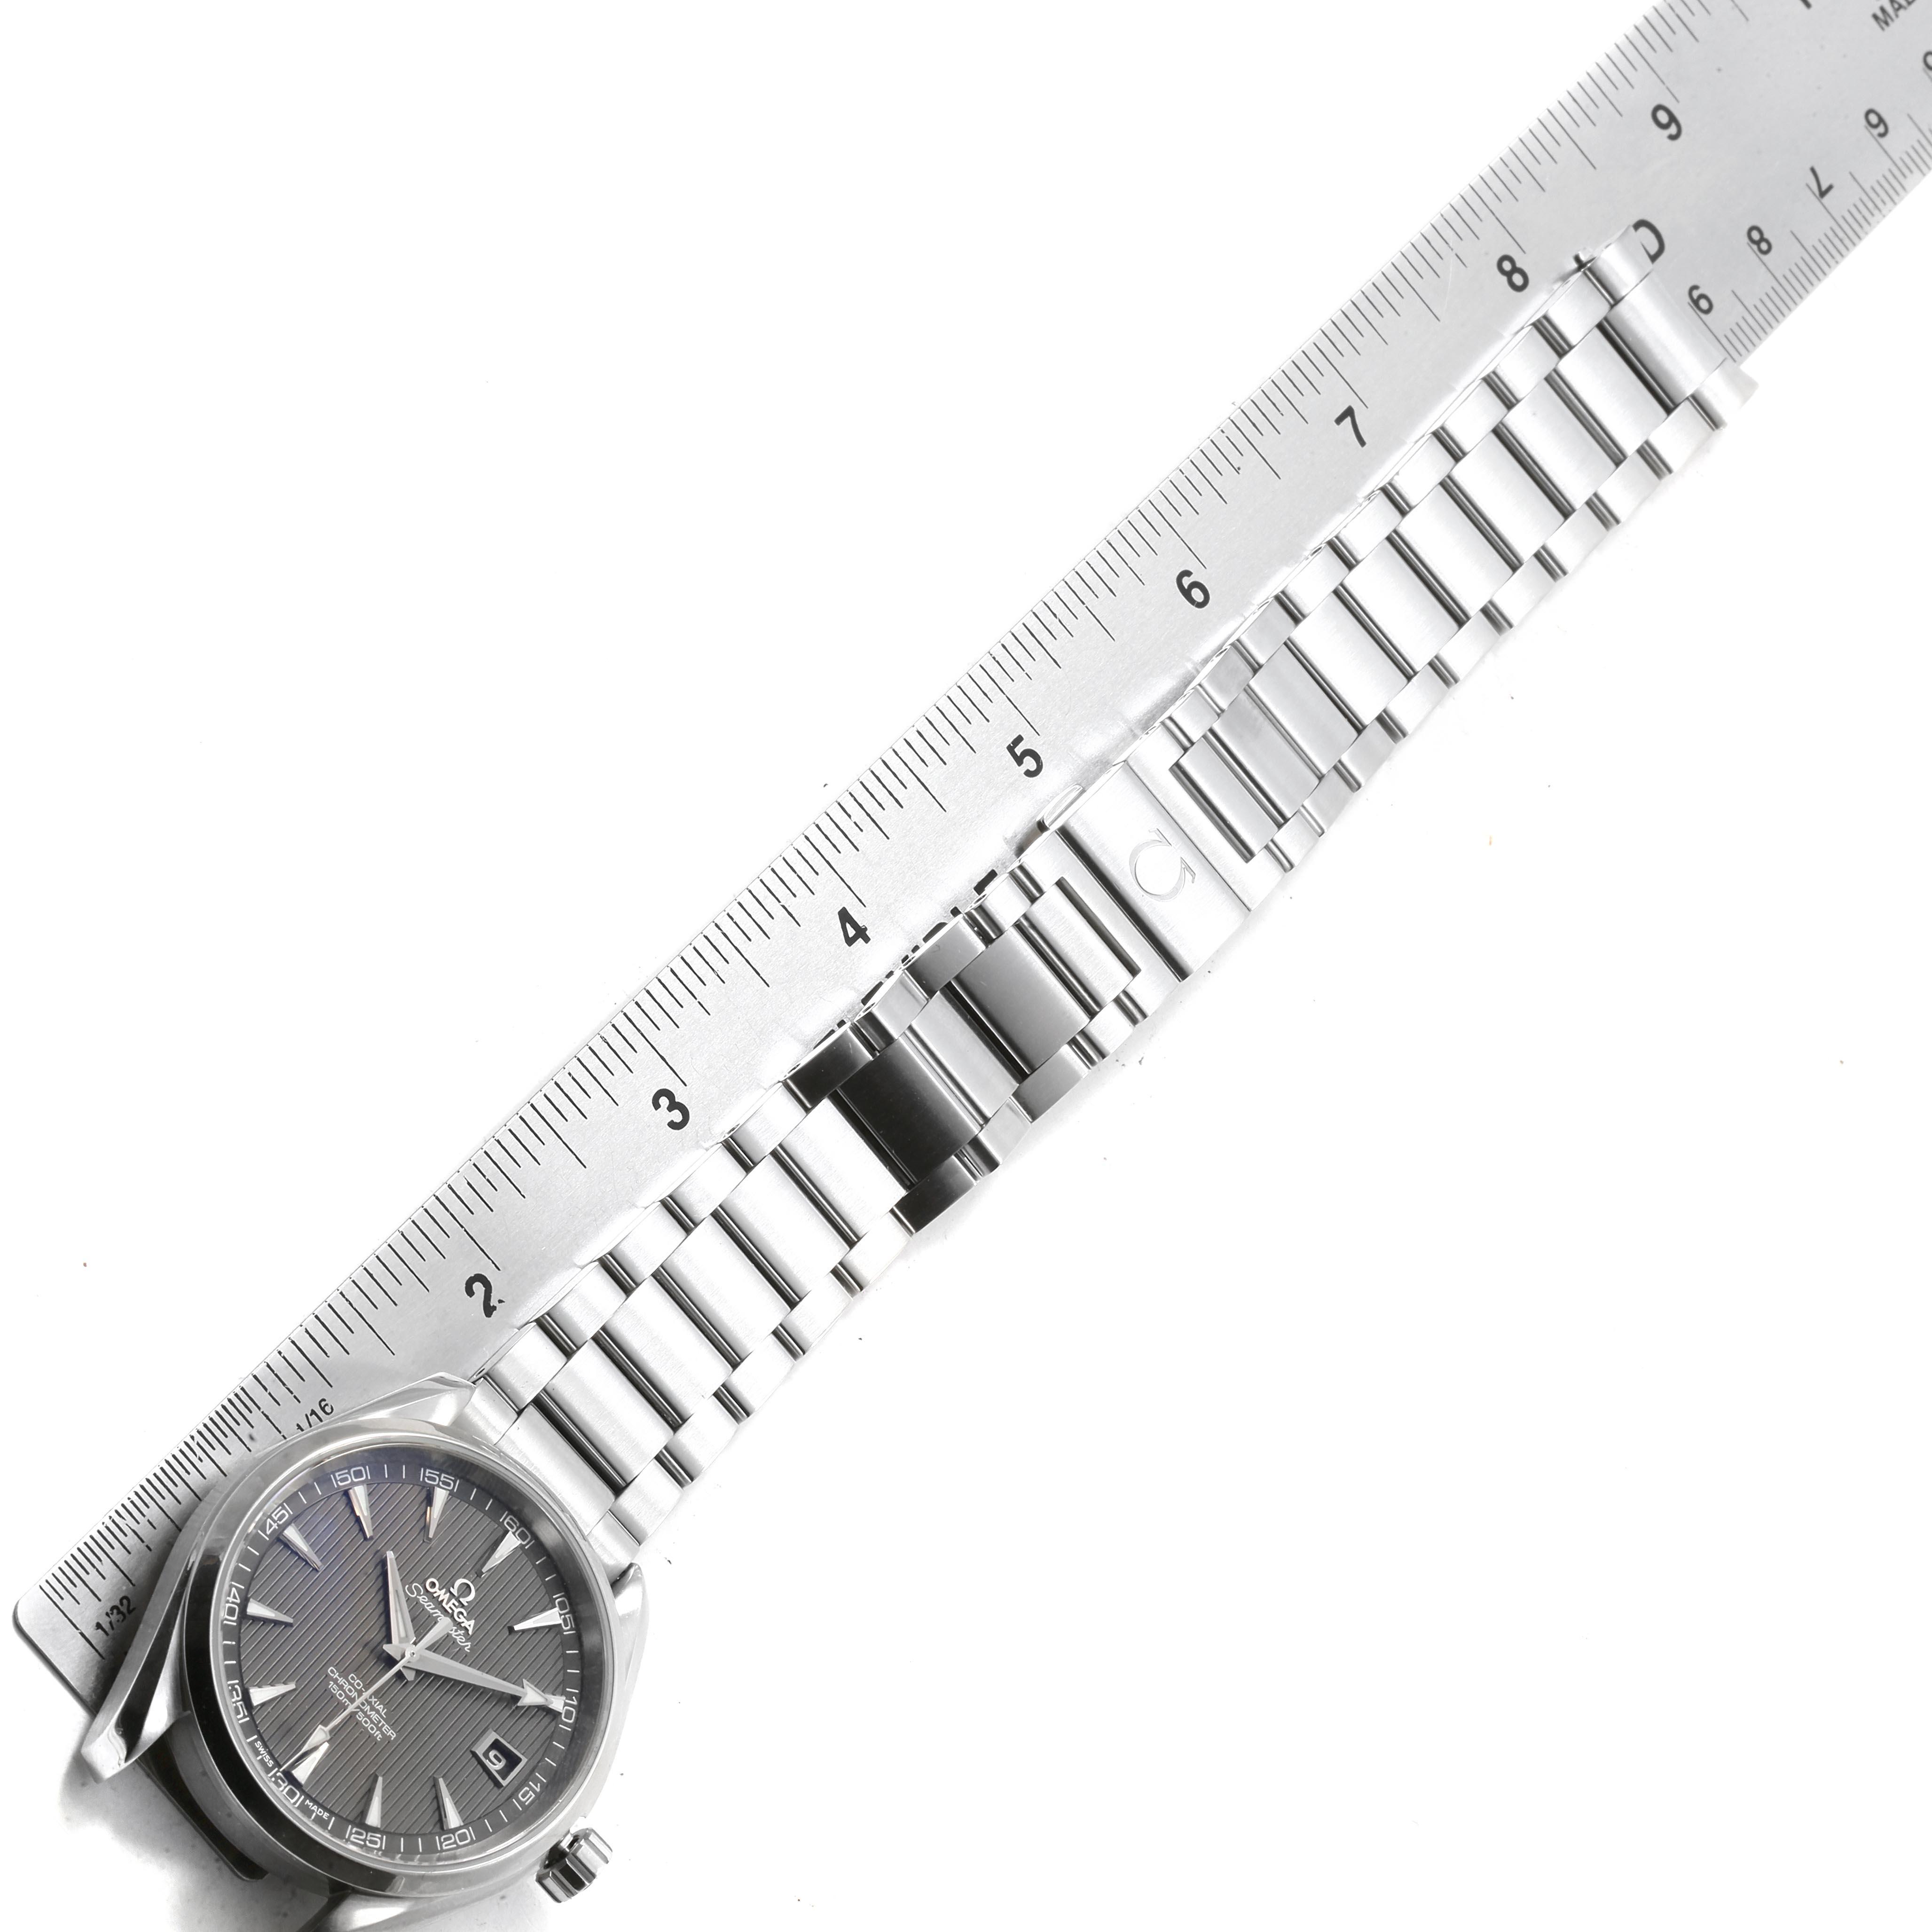 Omega Seamaster Aqua Terra Grey Dial Steel Mens Watch 231.10.42.21.06.001 Card SwissWatchExpo